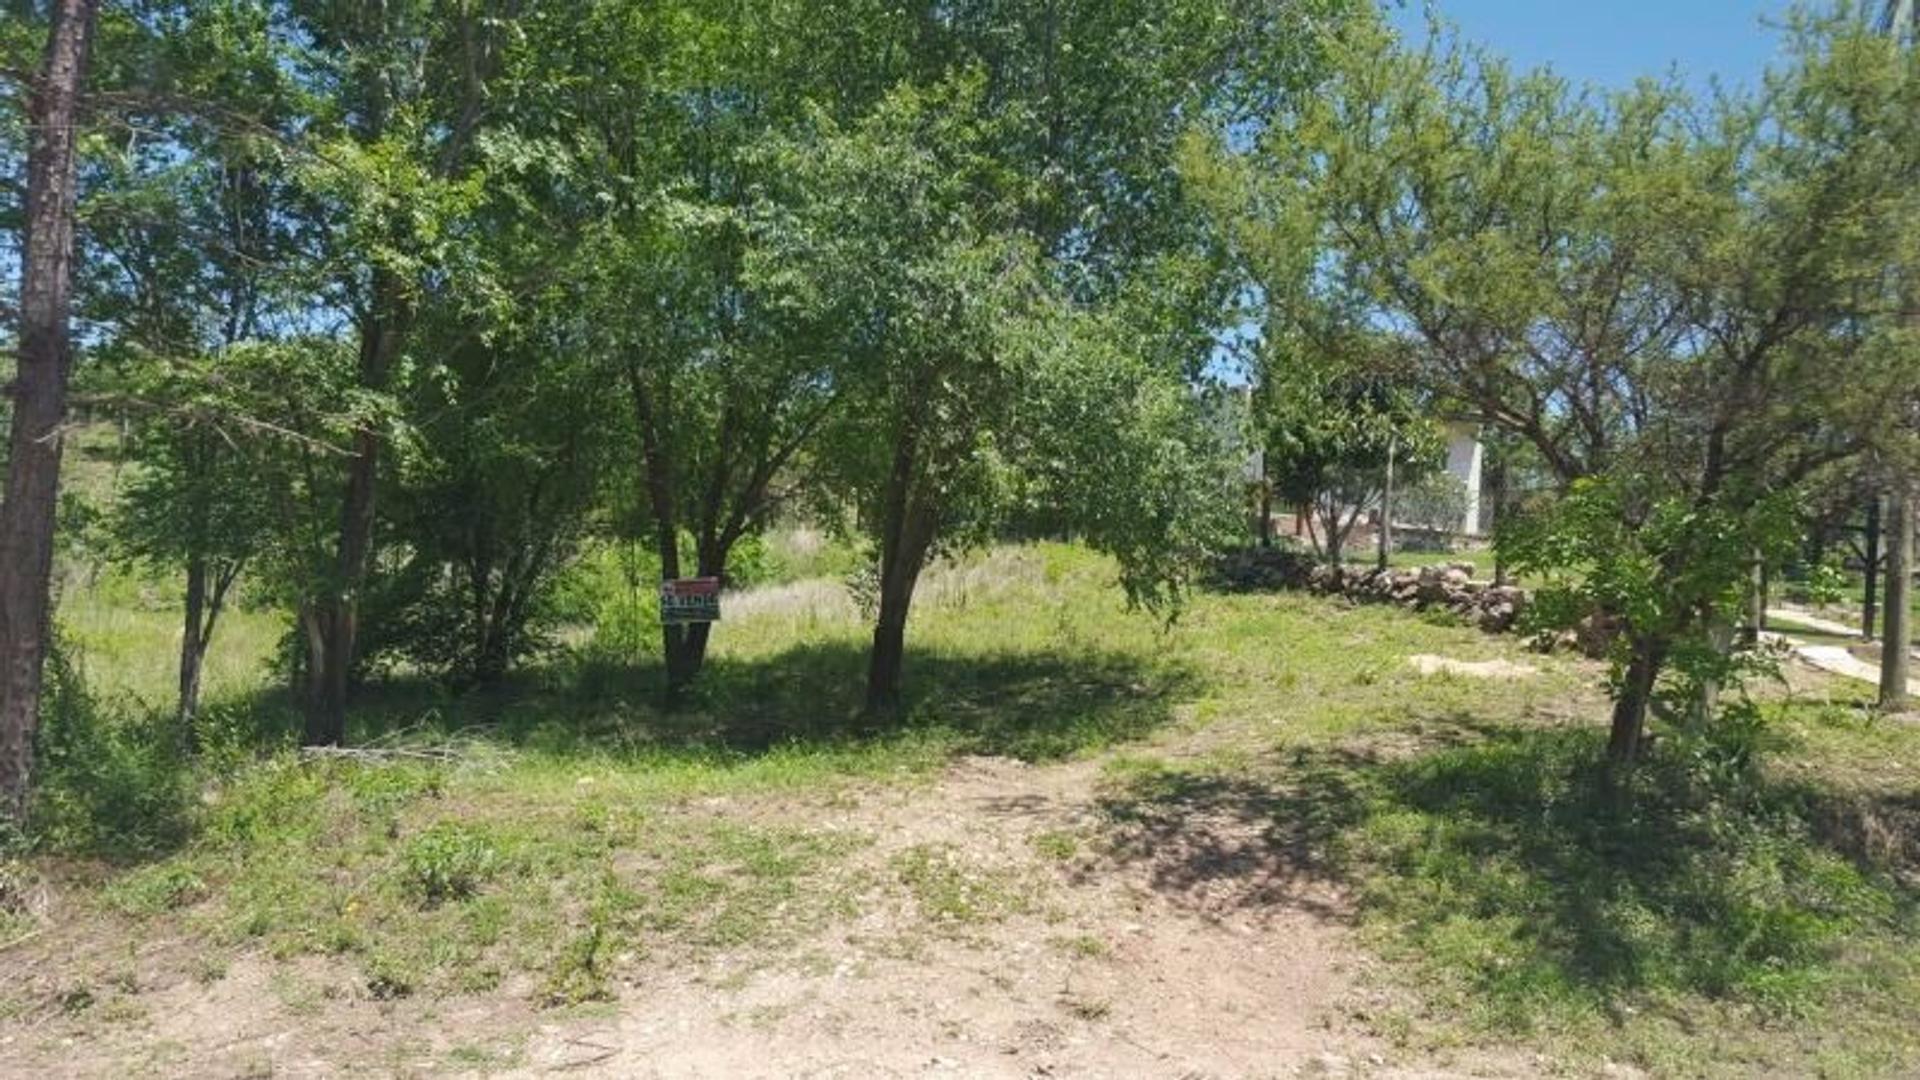 Nºref: 569 -TERRENO EN SUNCHO HUAYCO, BIALET MASSE A POCAS CUADRAS DE RUTA 38